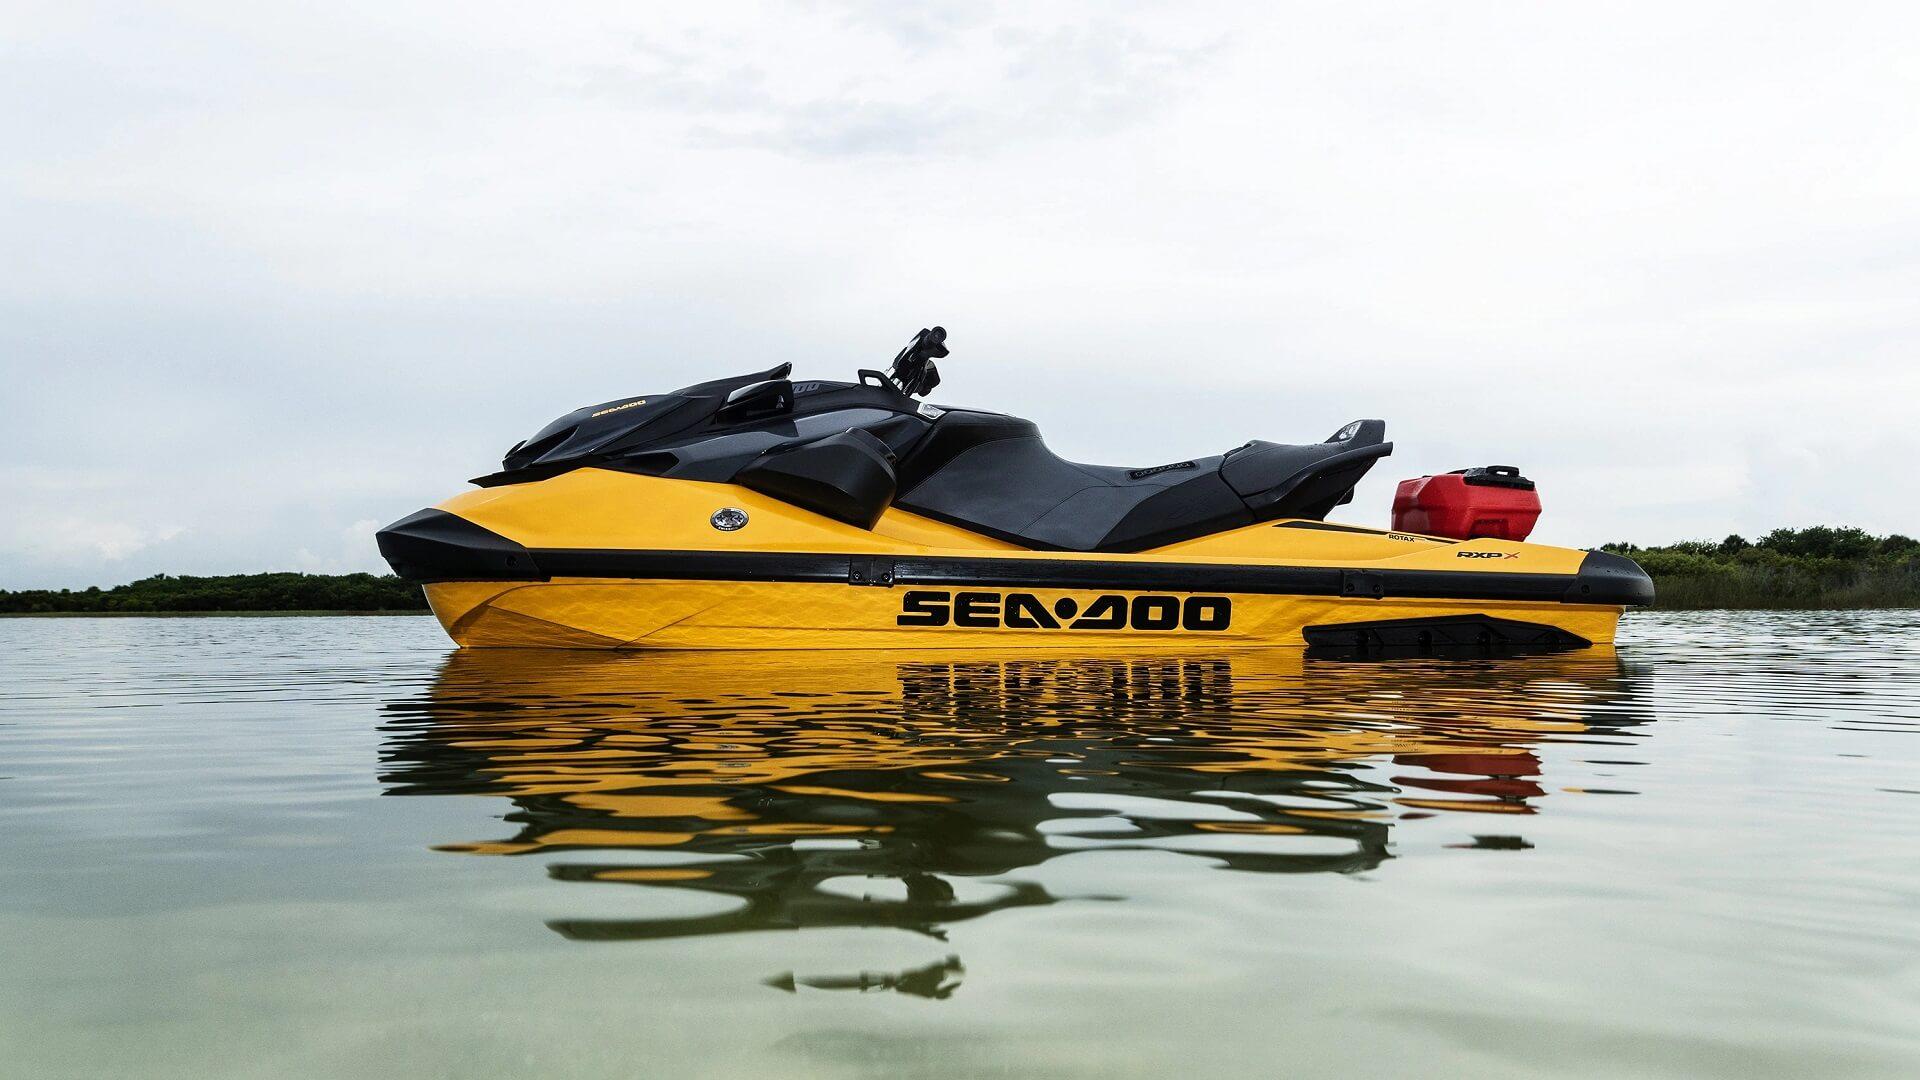 Jetski 2021 Quickest Personal Watercraft